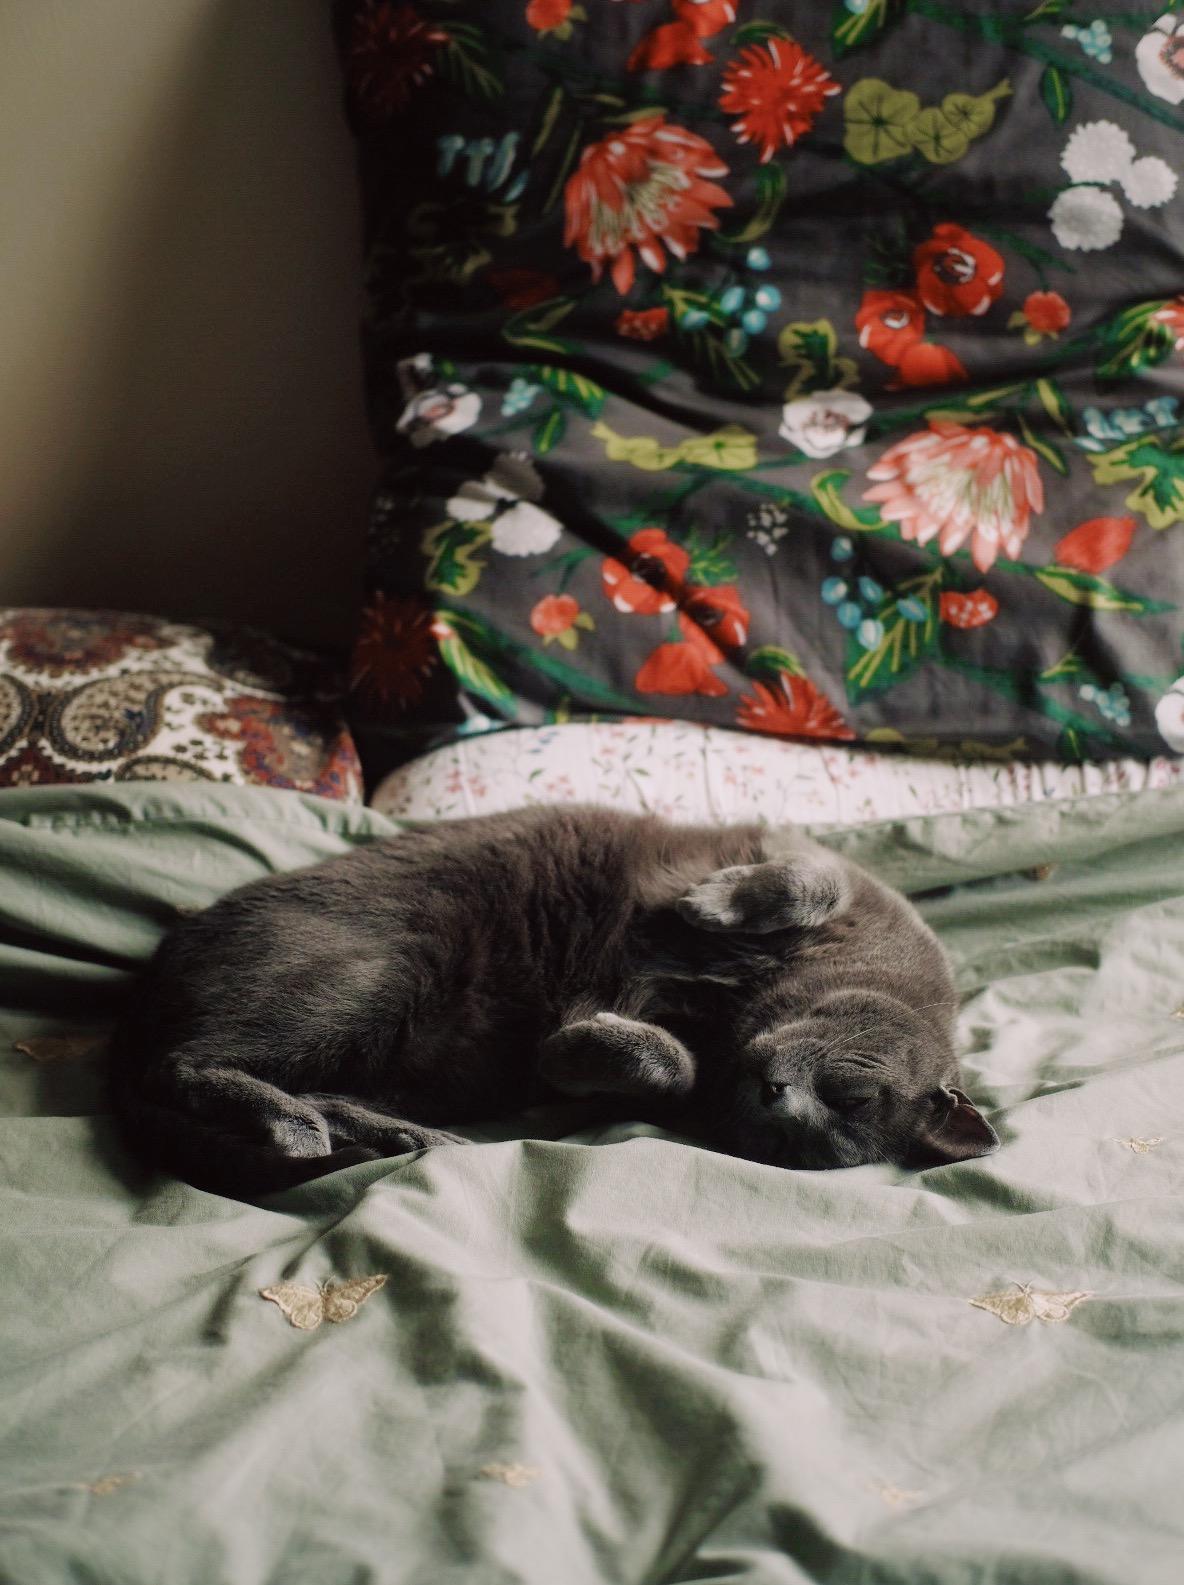 grey cat sleeping on bedsheets